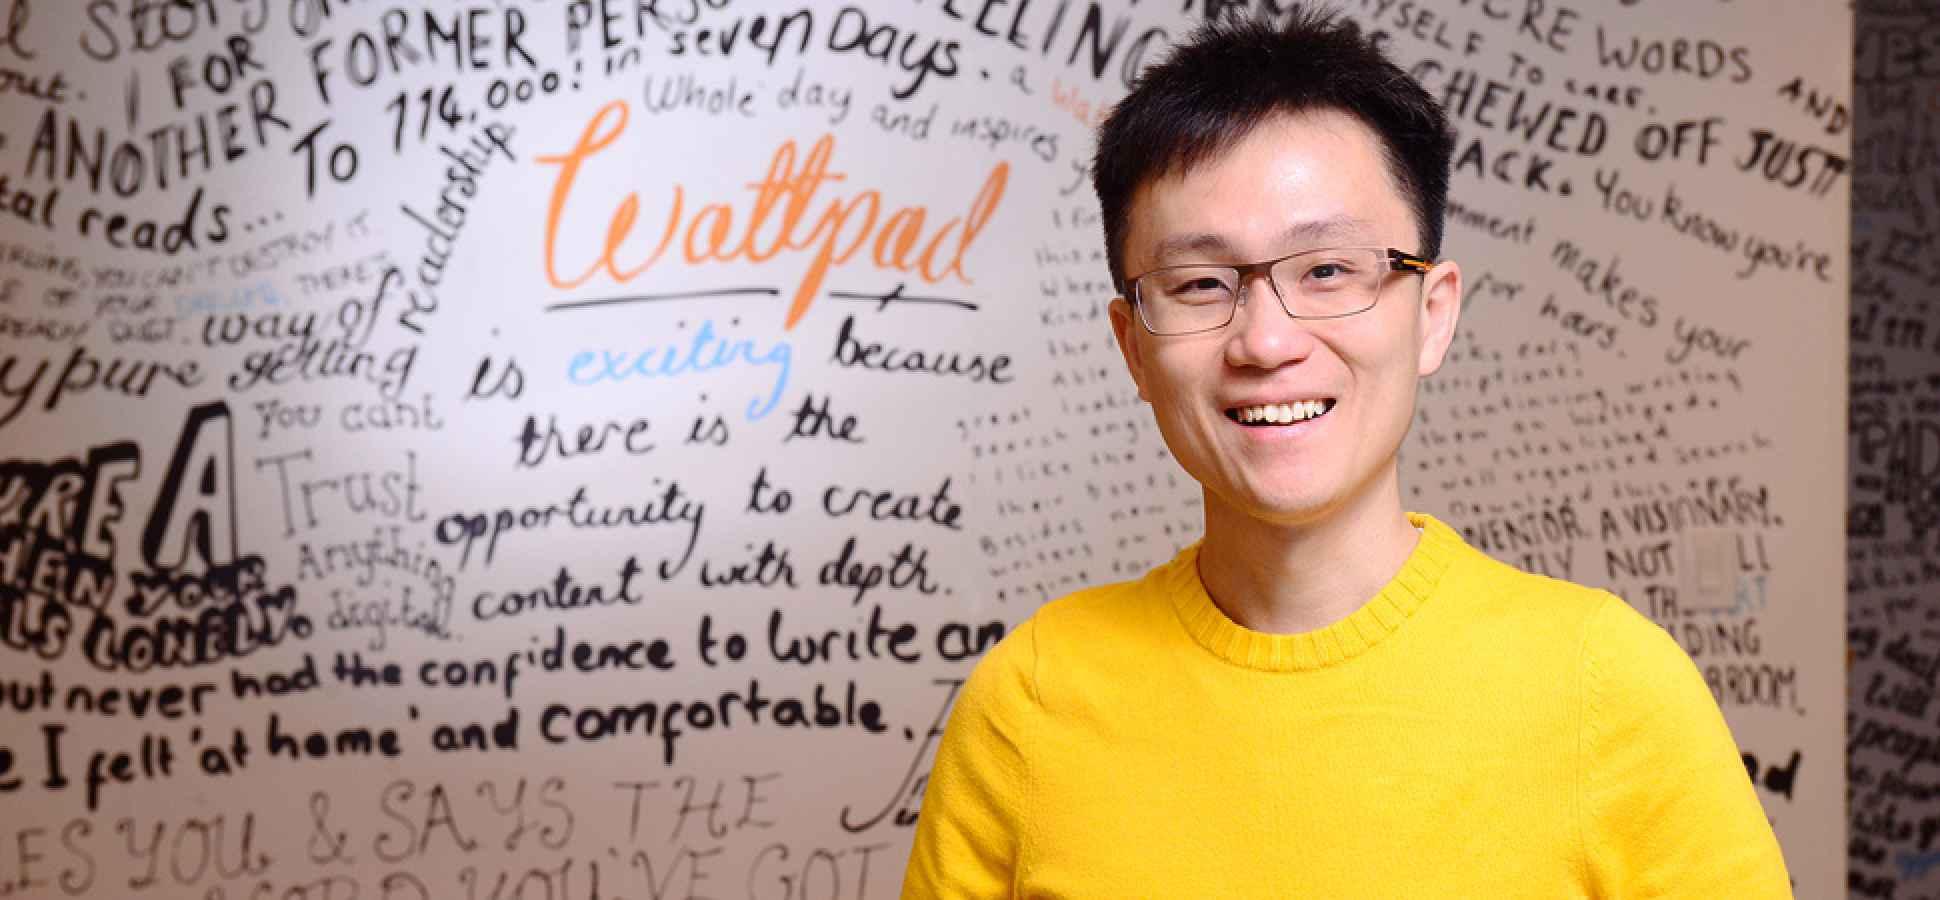 This Entrepreneur Raised $70 Million by Ignoring Some Popular Startup Advice